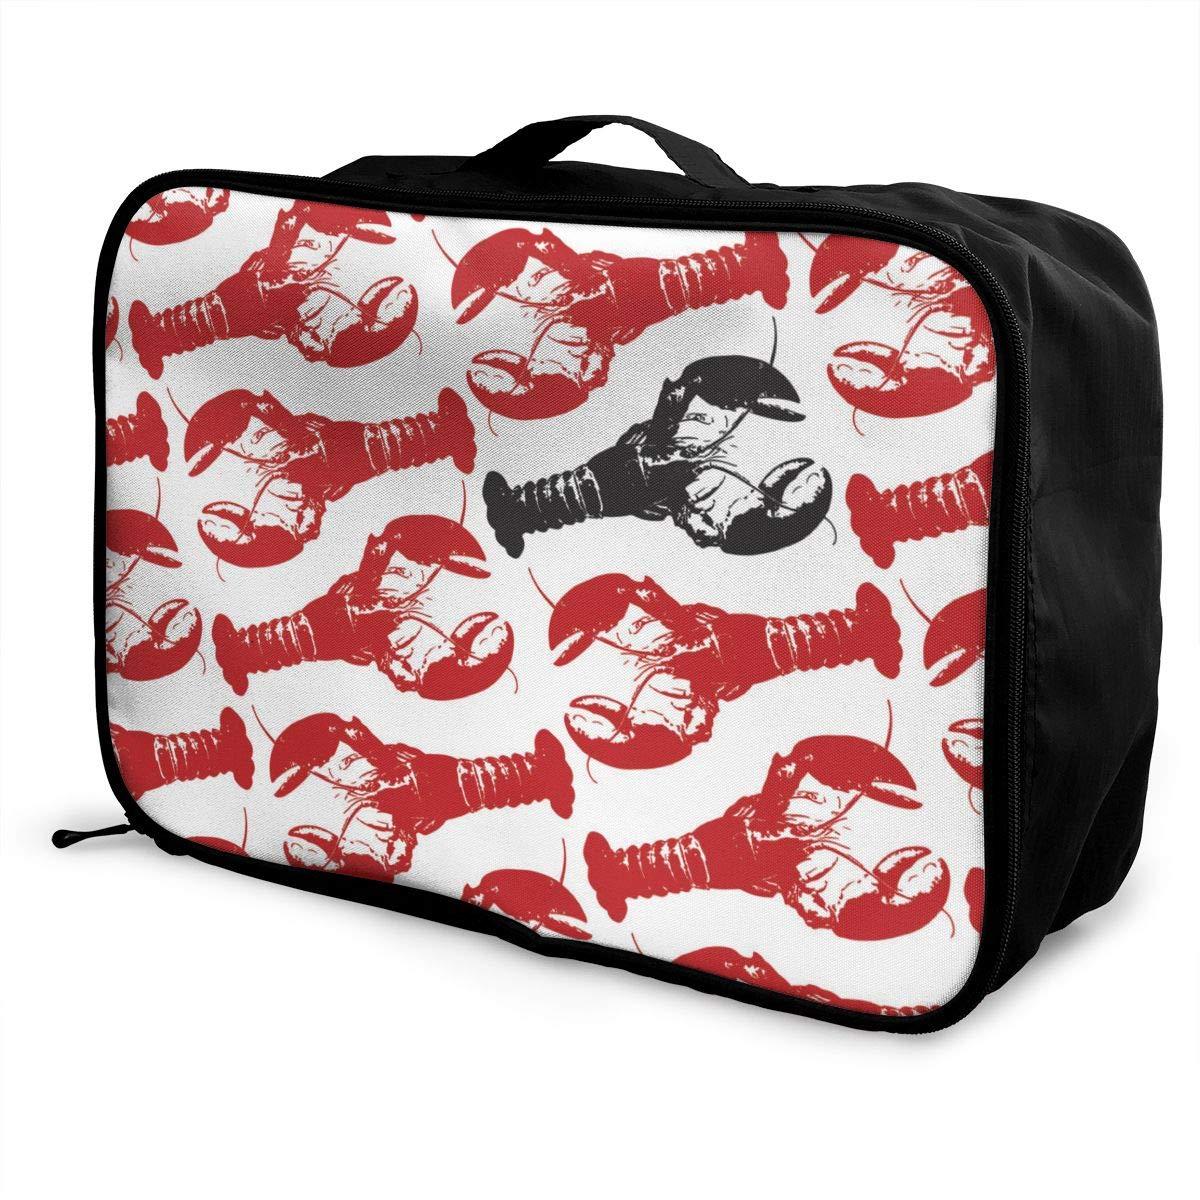 Lobster Lobster Black Lobster Travel Duffel Bag Casual Large Capacity Portable Luggage Bag Suitcase Storage Bag Luggage Packing Tote Bag Weekend Trip